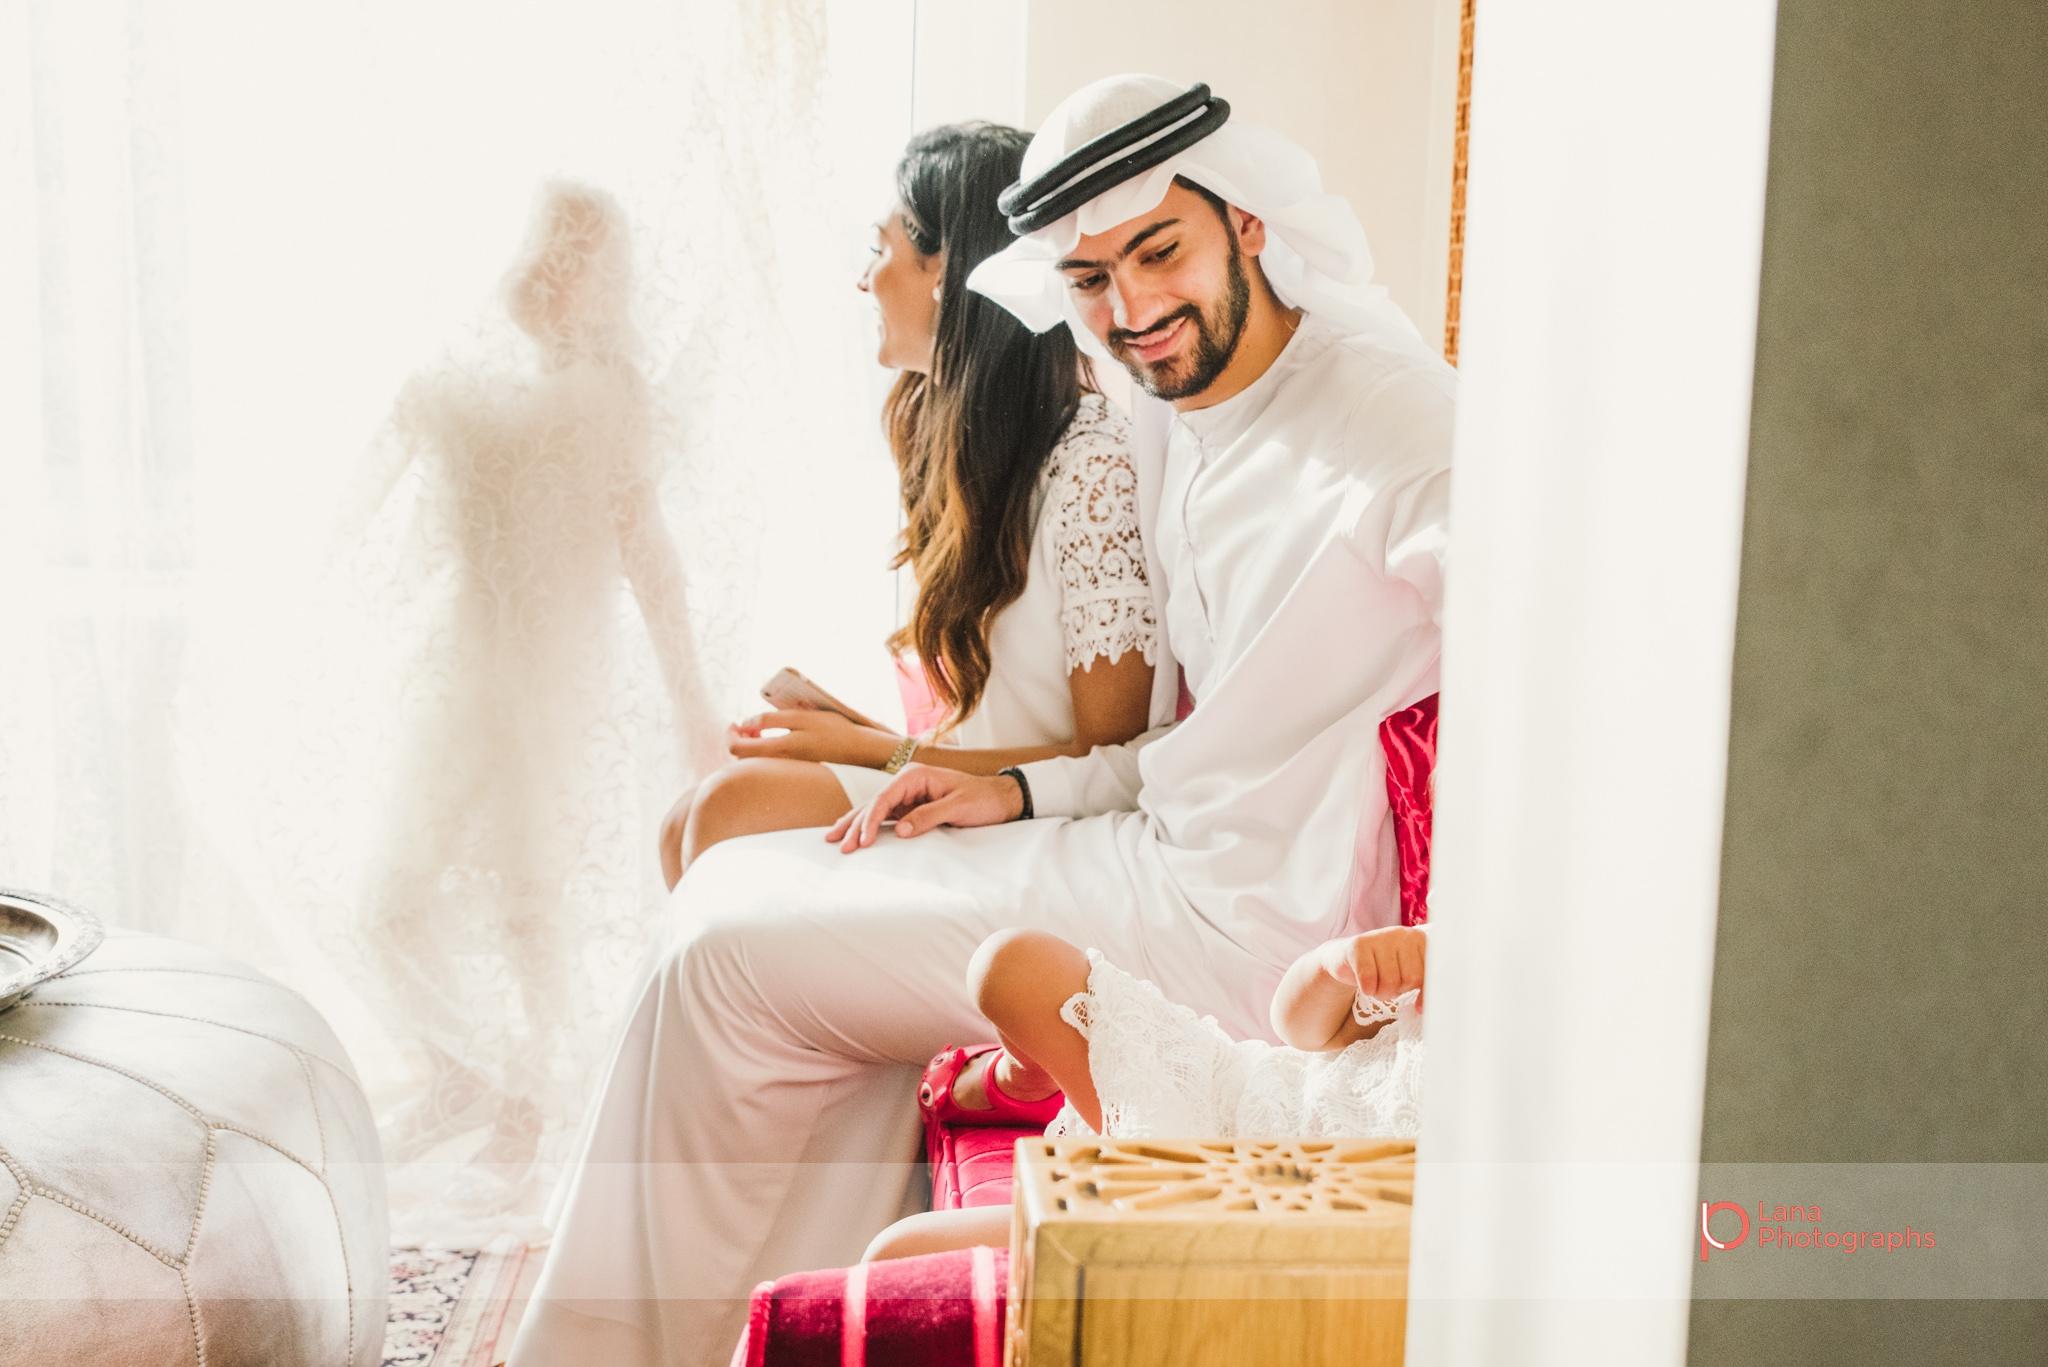 Lana Photographs Family Photographer Dubai Top Family Photographers silhouette of girl in the curtains